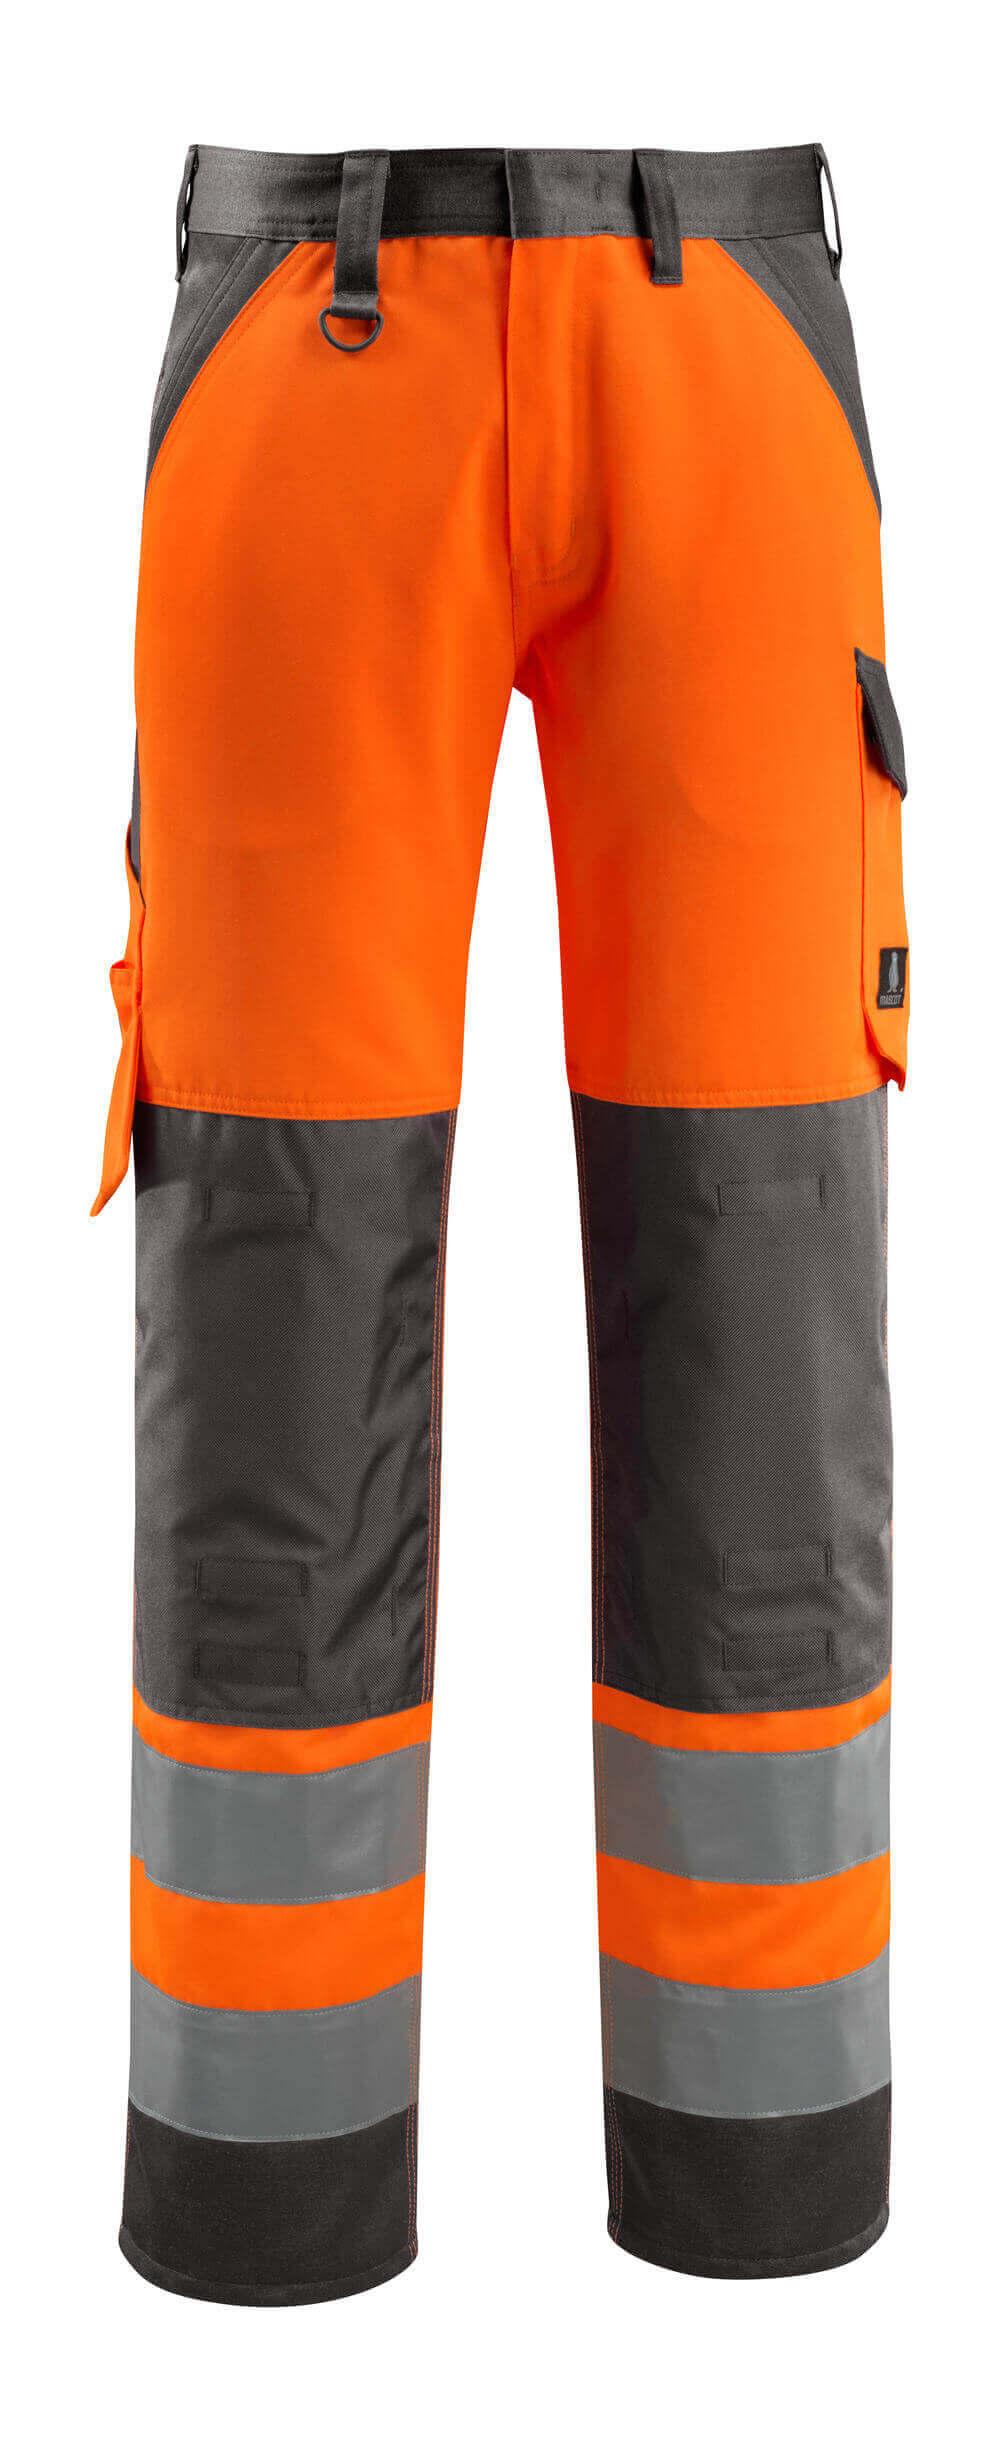 15979-948-1418 Pants with kneepad pockets - hi-vis orange/dark anthracite